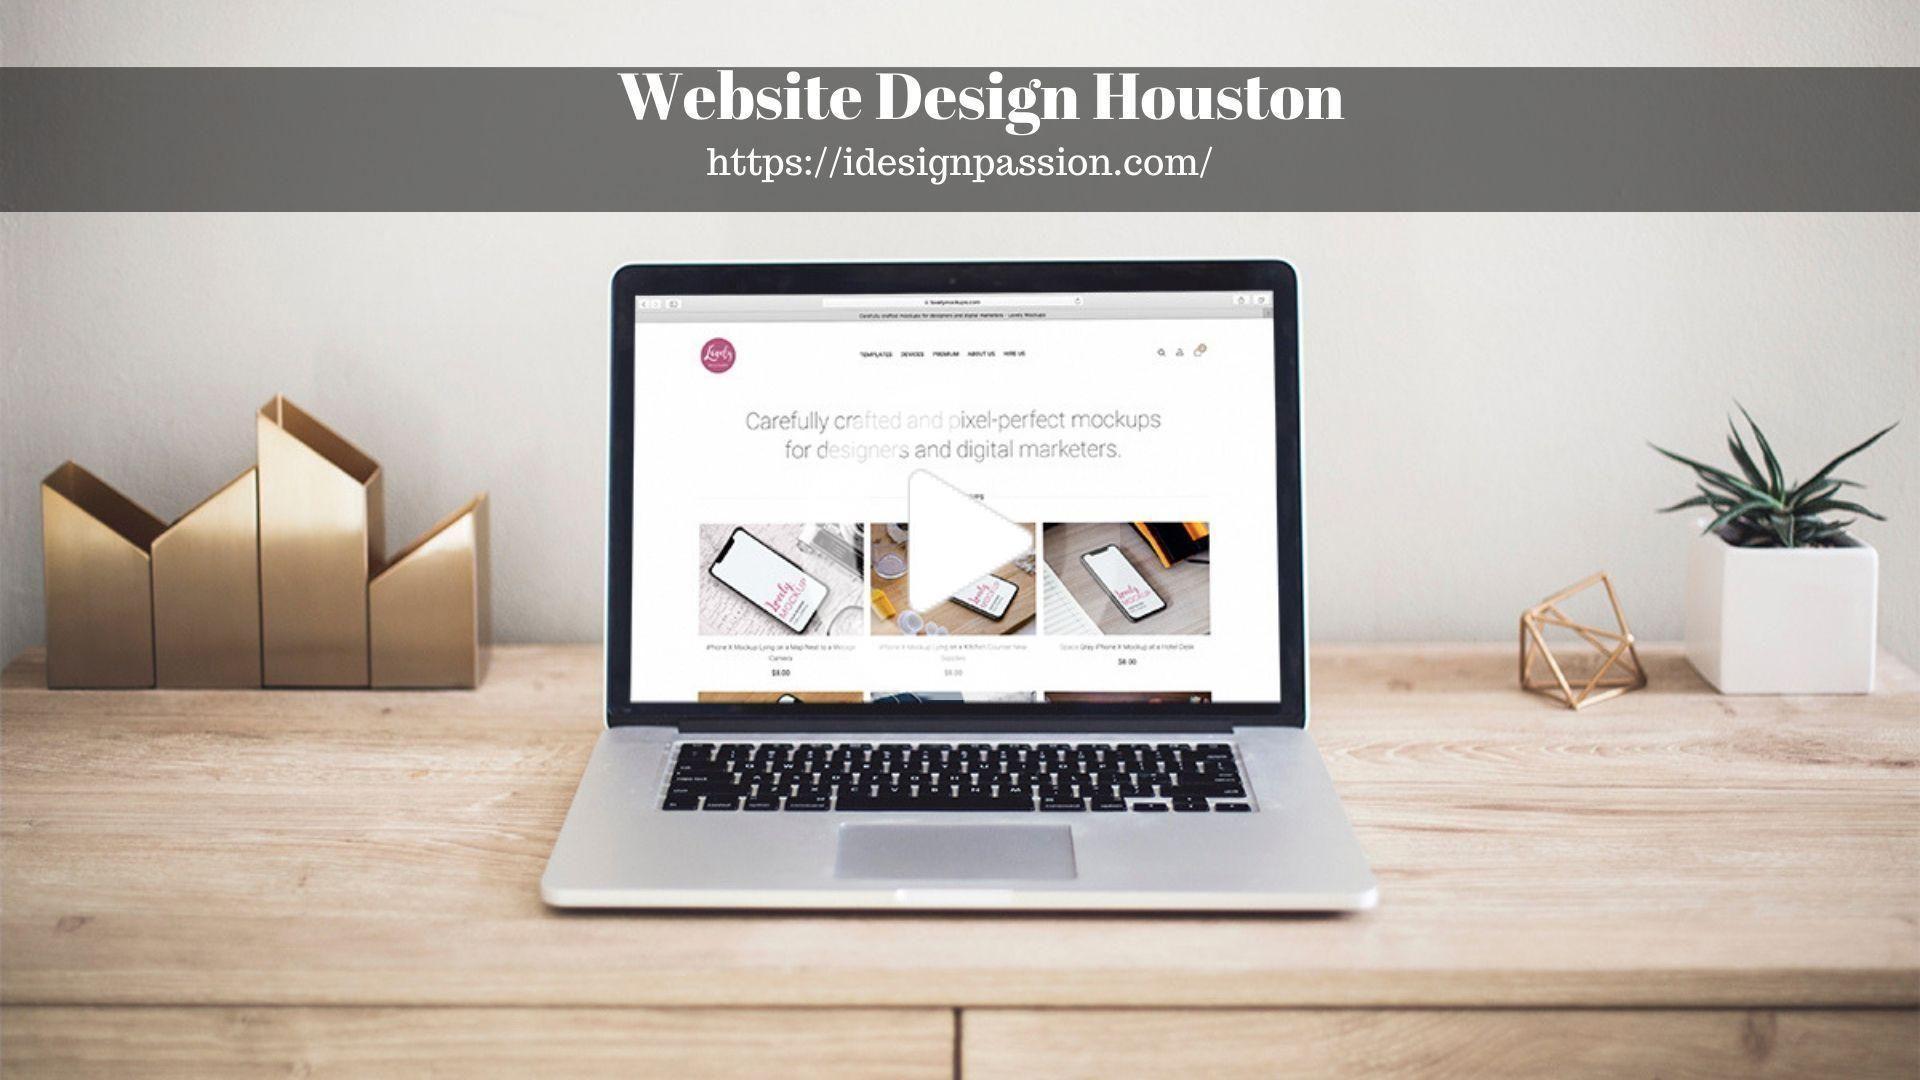 Best Web Design In Chicago In 2020 Best Web Design Web Design Firm Web Design